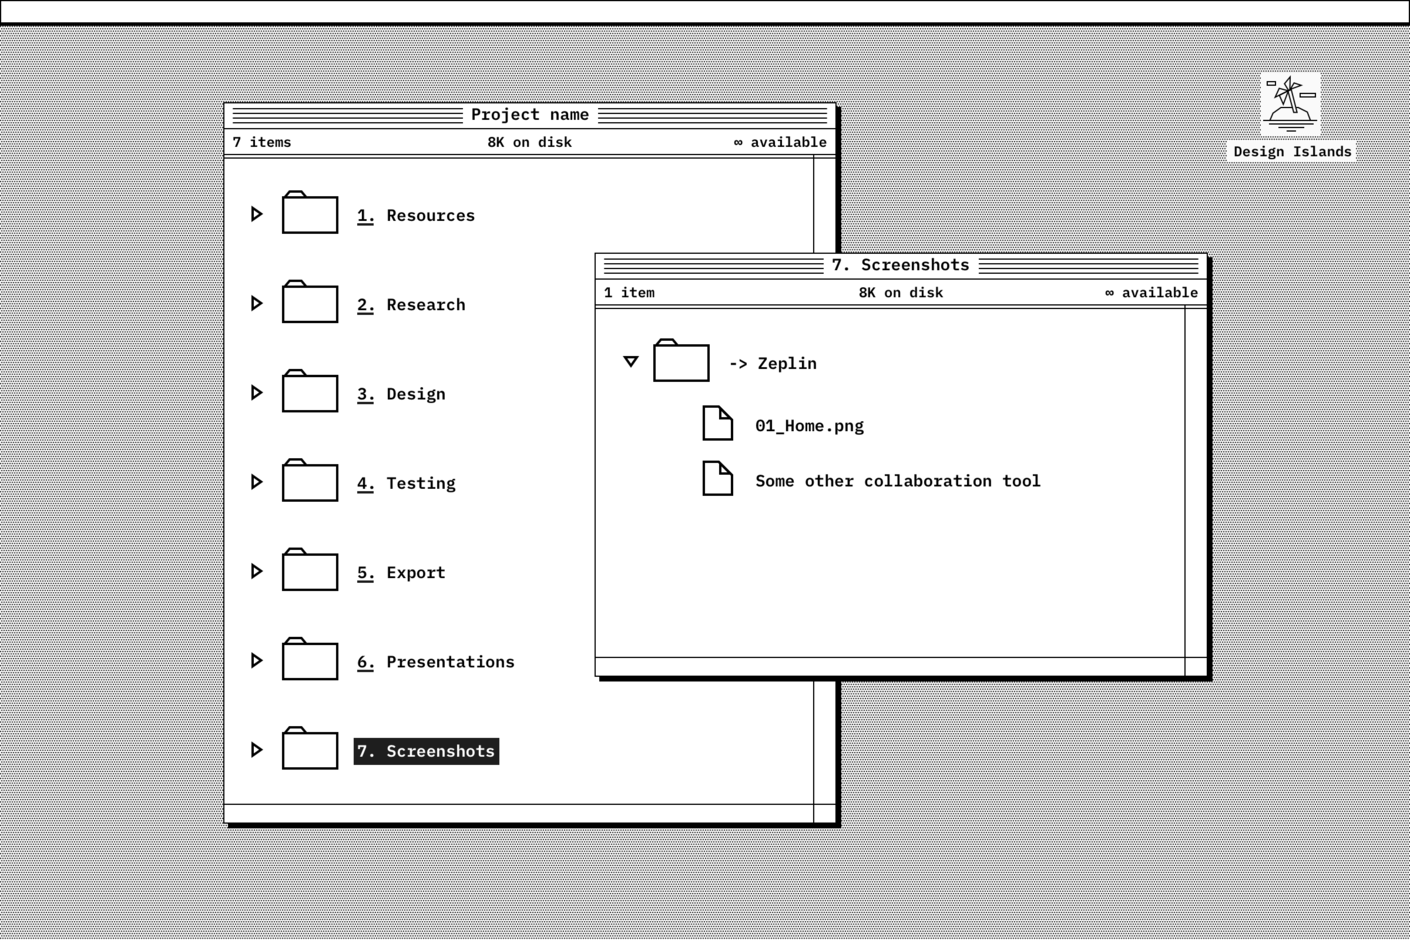 Screenshots folder